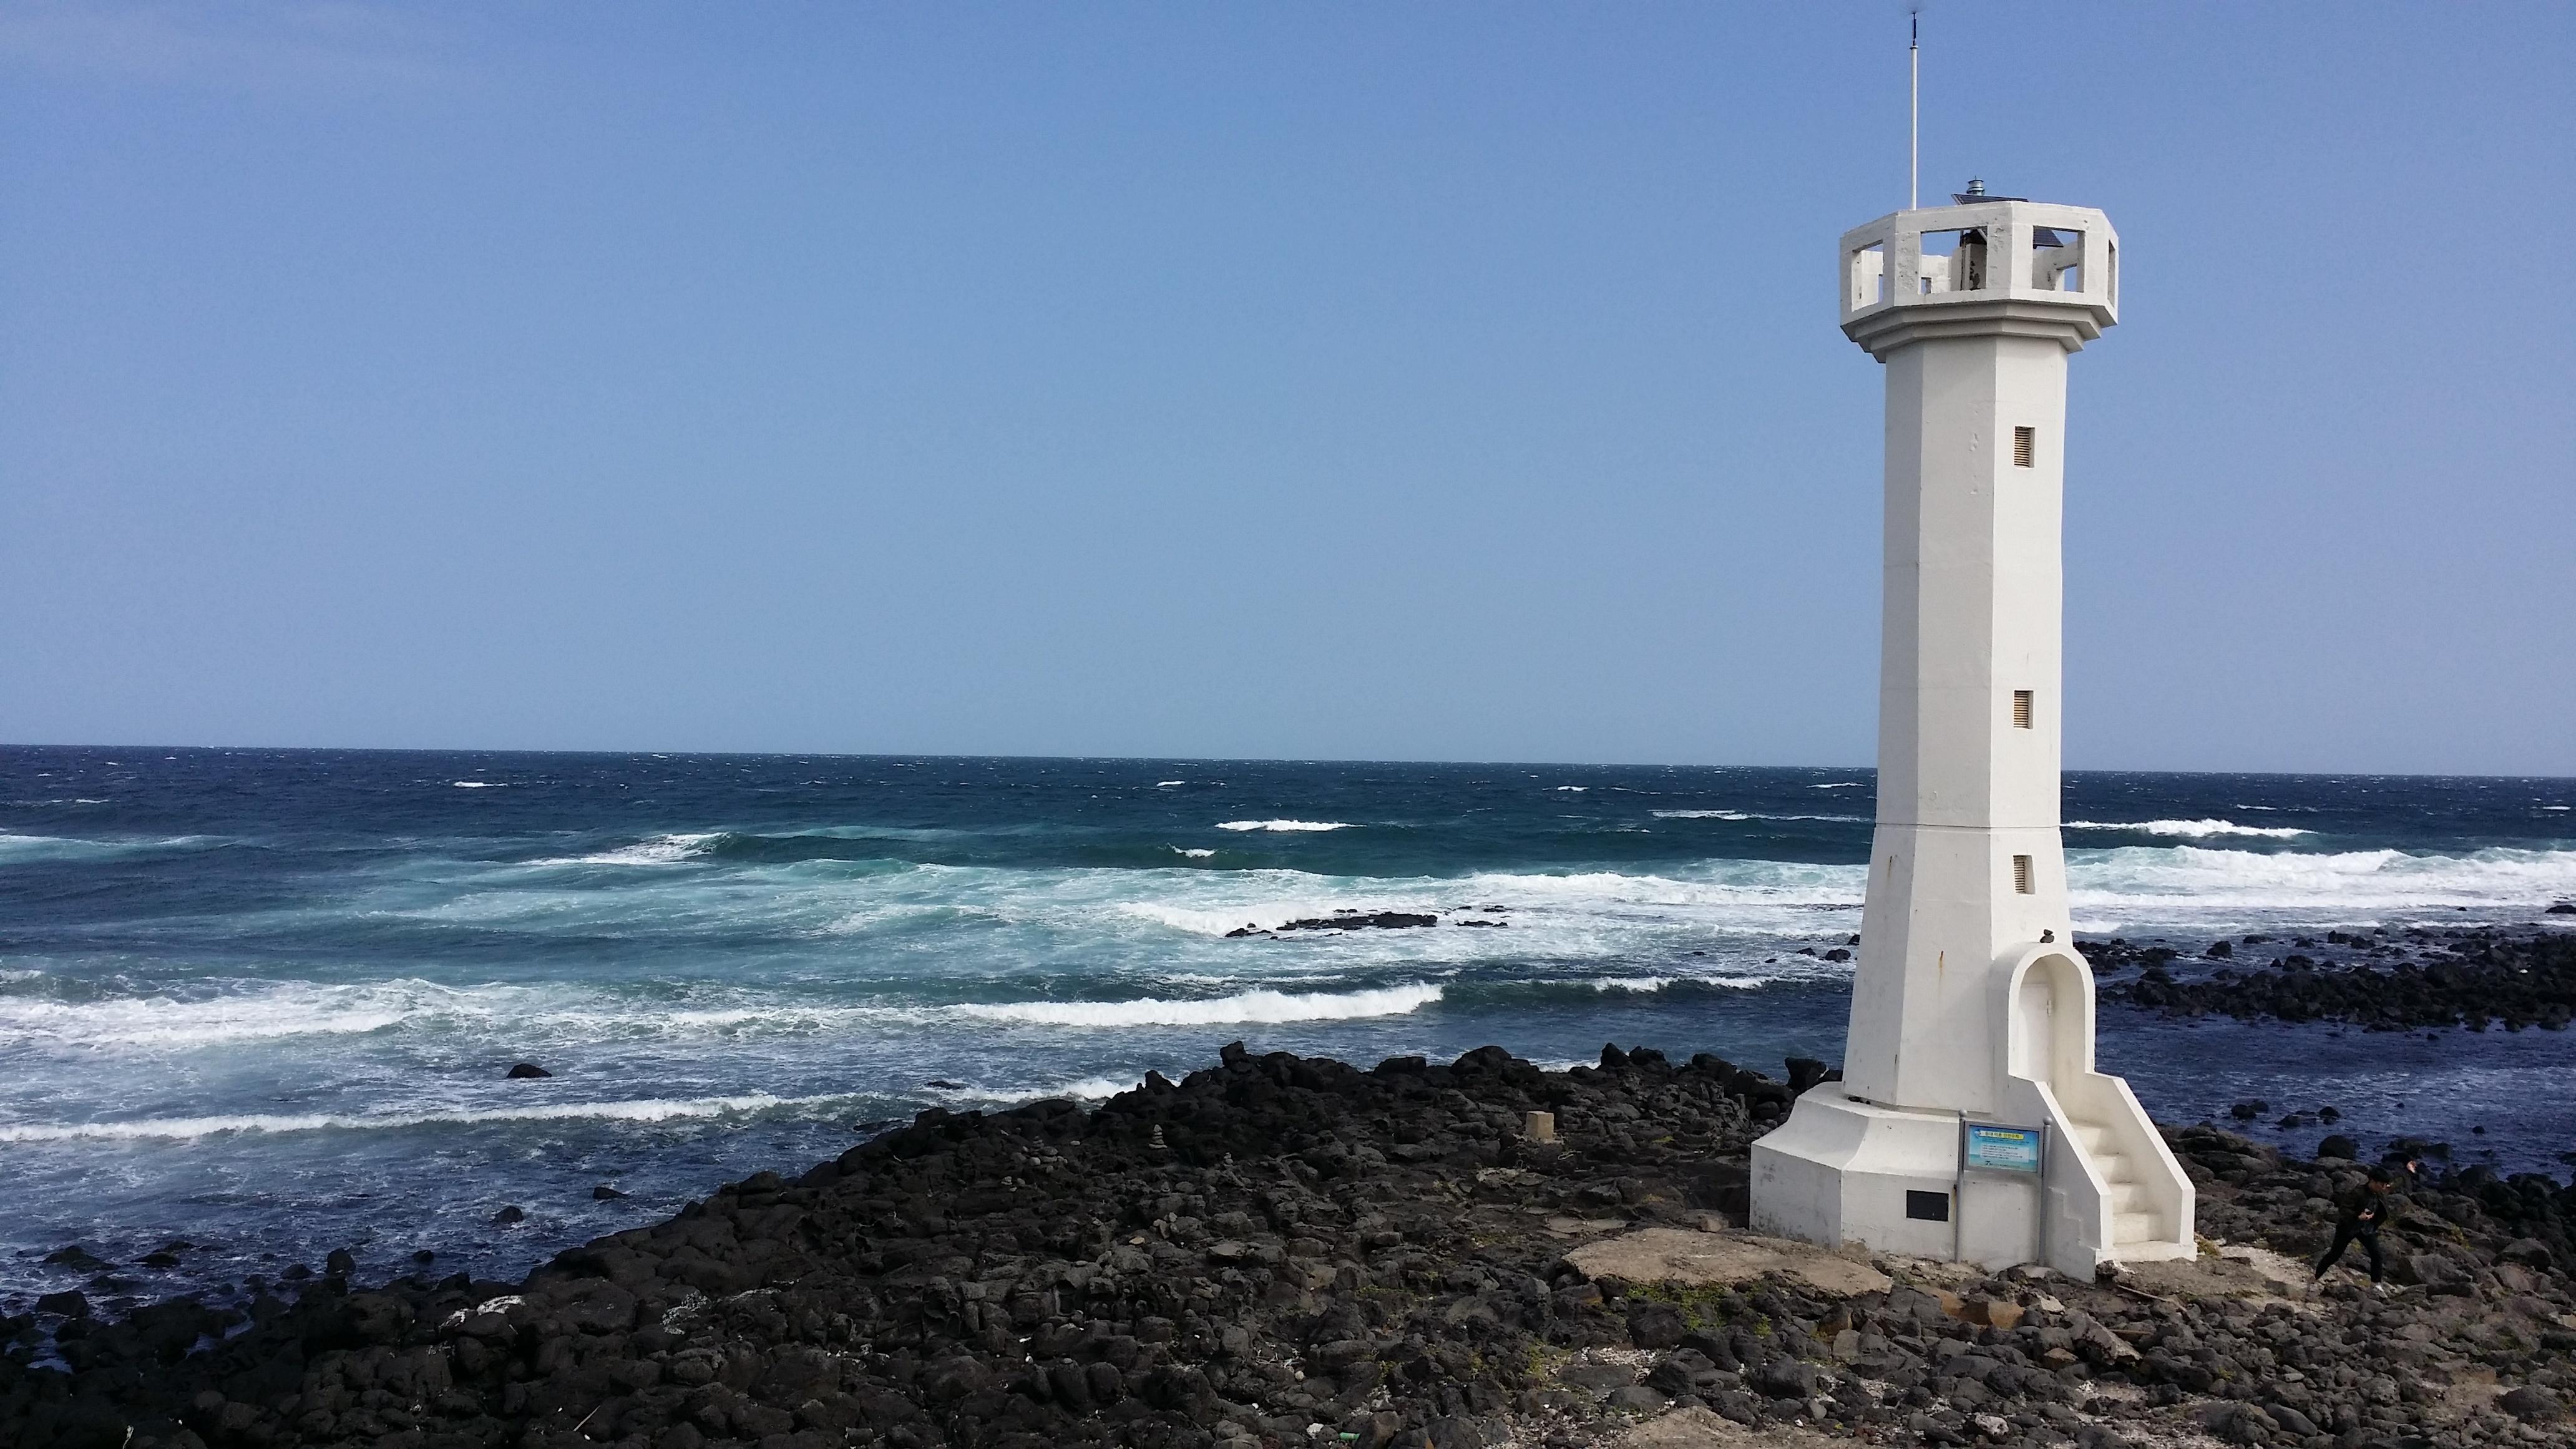 Free Images   Landscape  Coast  Nature  Ocean  Lighthouse